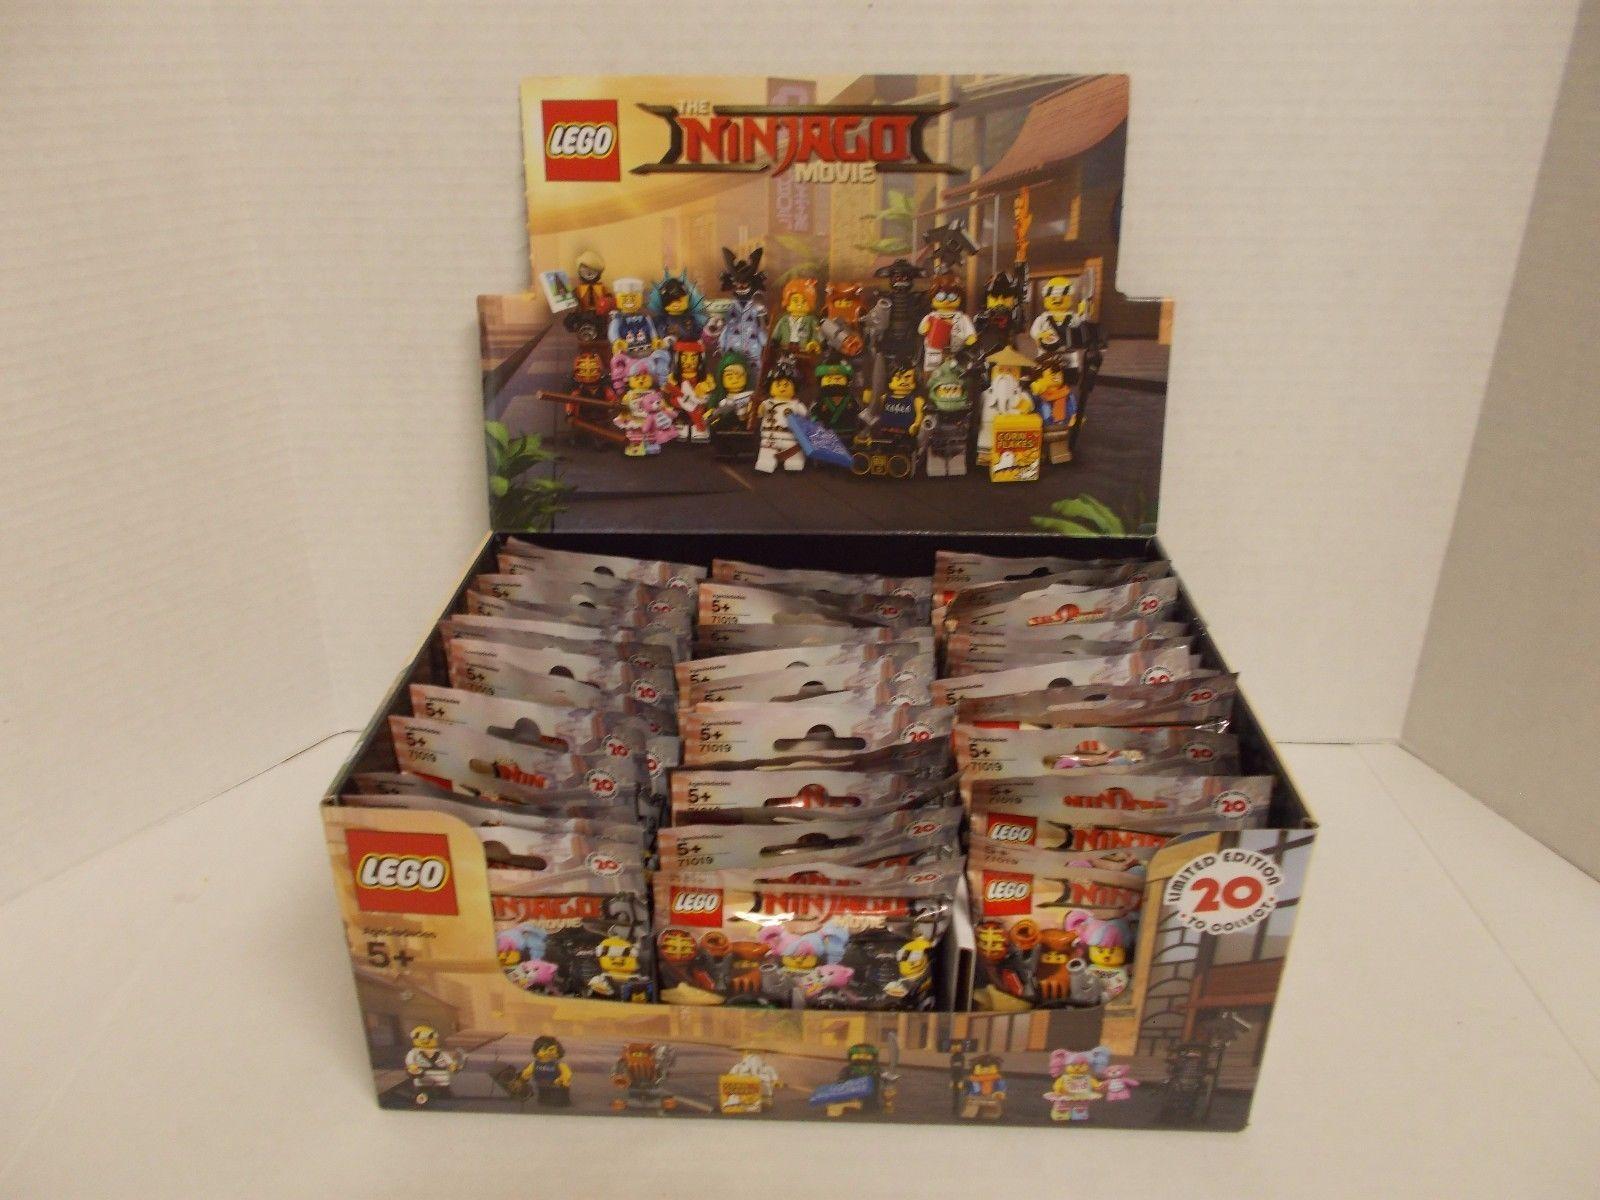 New Lego 71019 Ninjago Minifigures Lot Of 60 Full Case 71017 Batman Movie Series Box